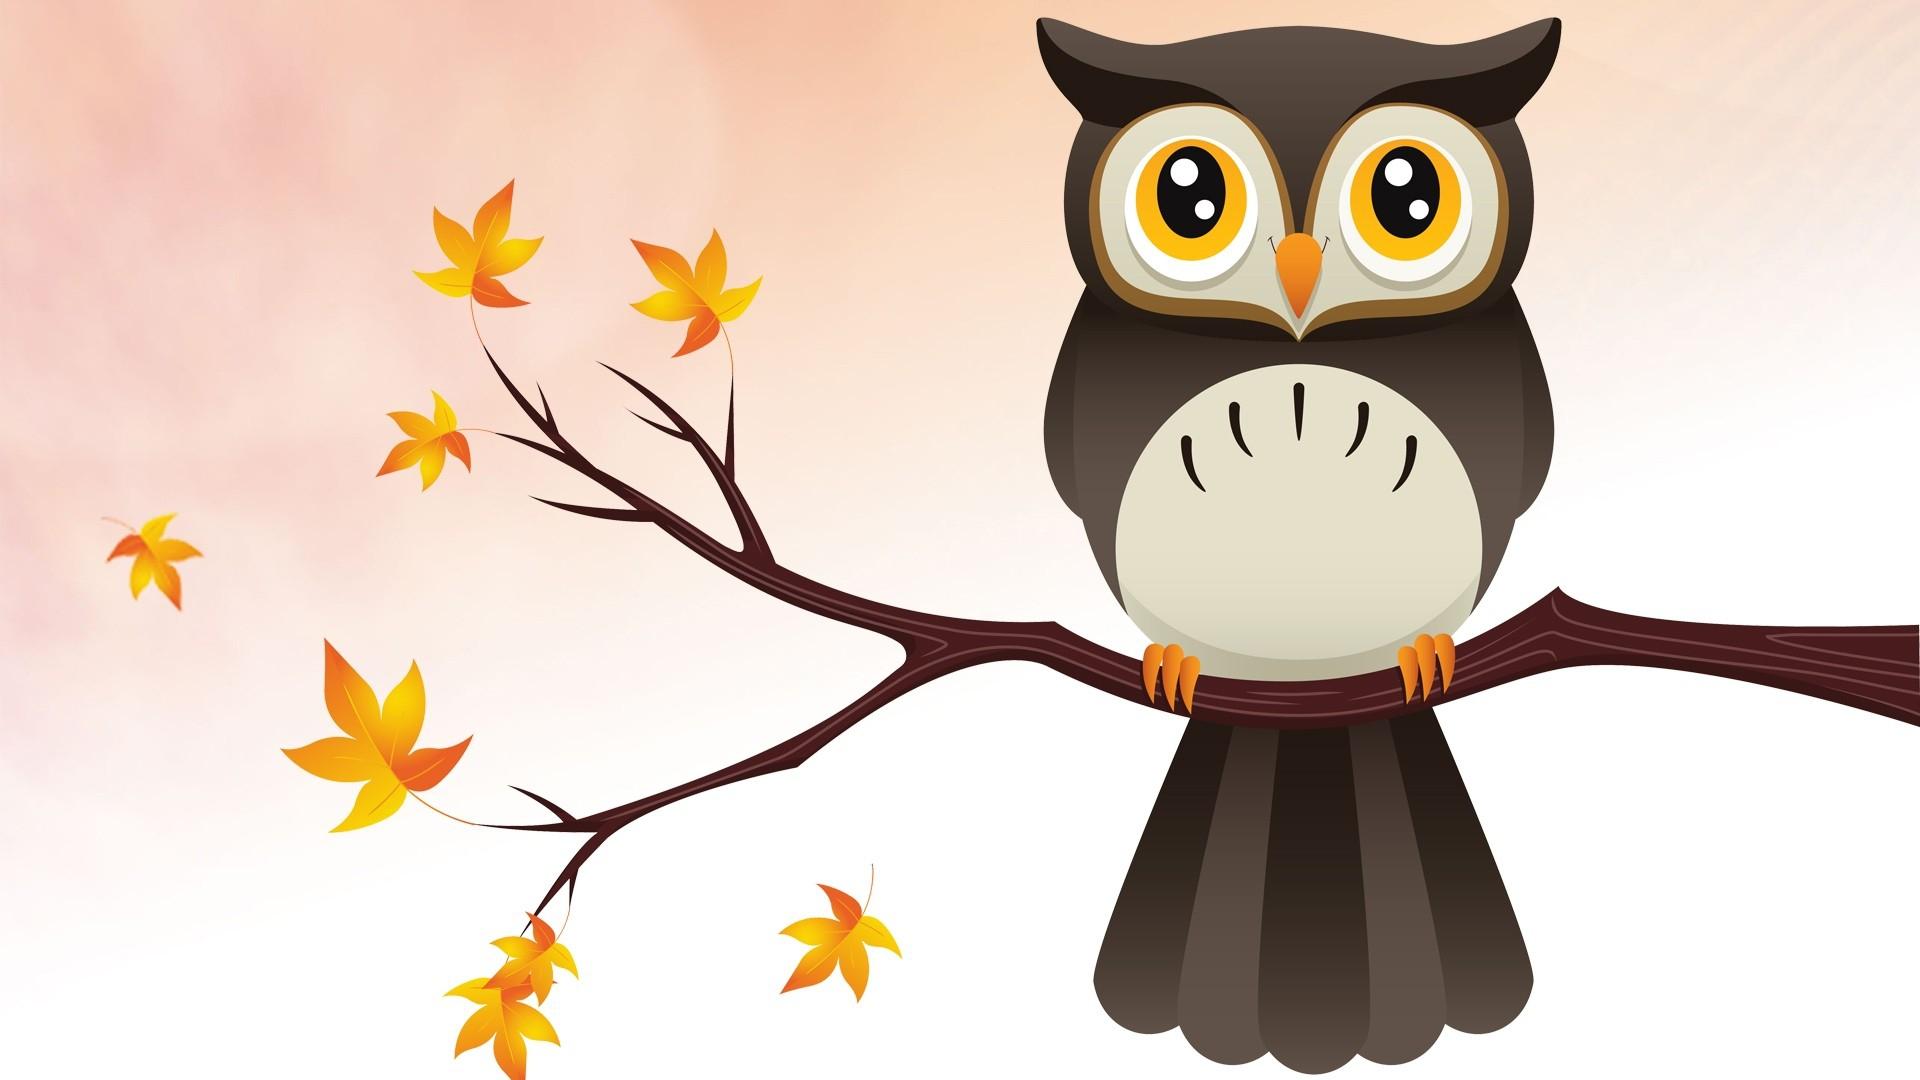 Cute Owl Background Hd Cute Owl Wallpaper Hd 1920x1080 Wallpaper Teahub Io